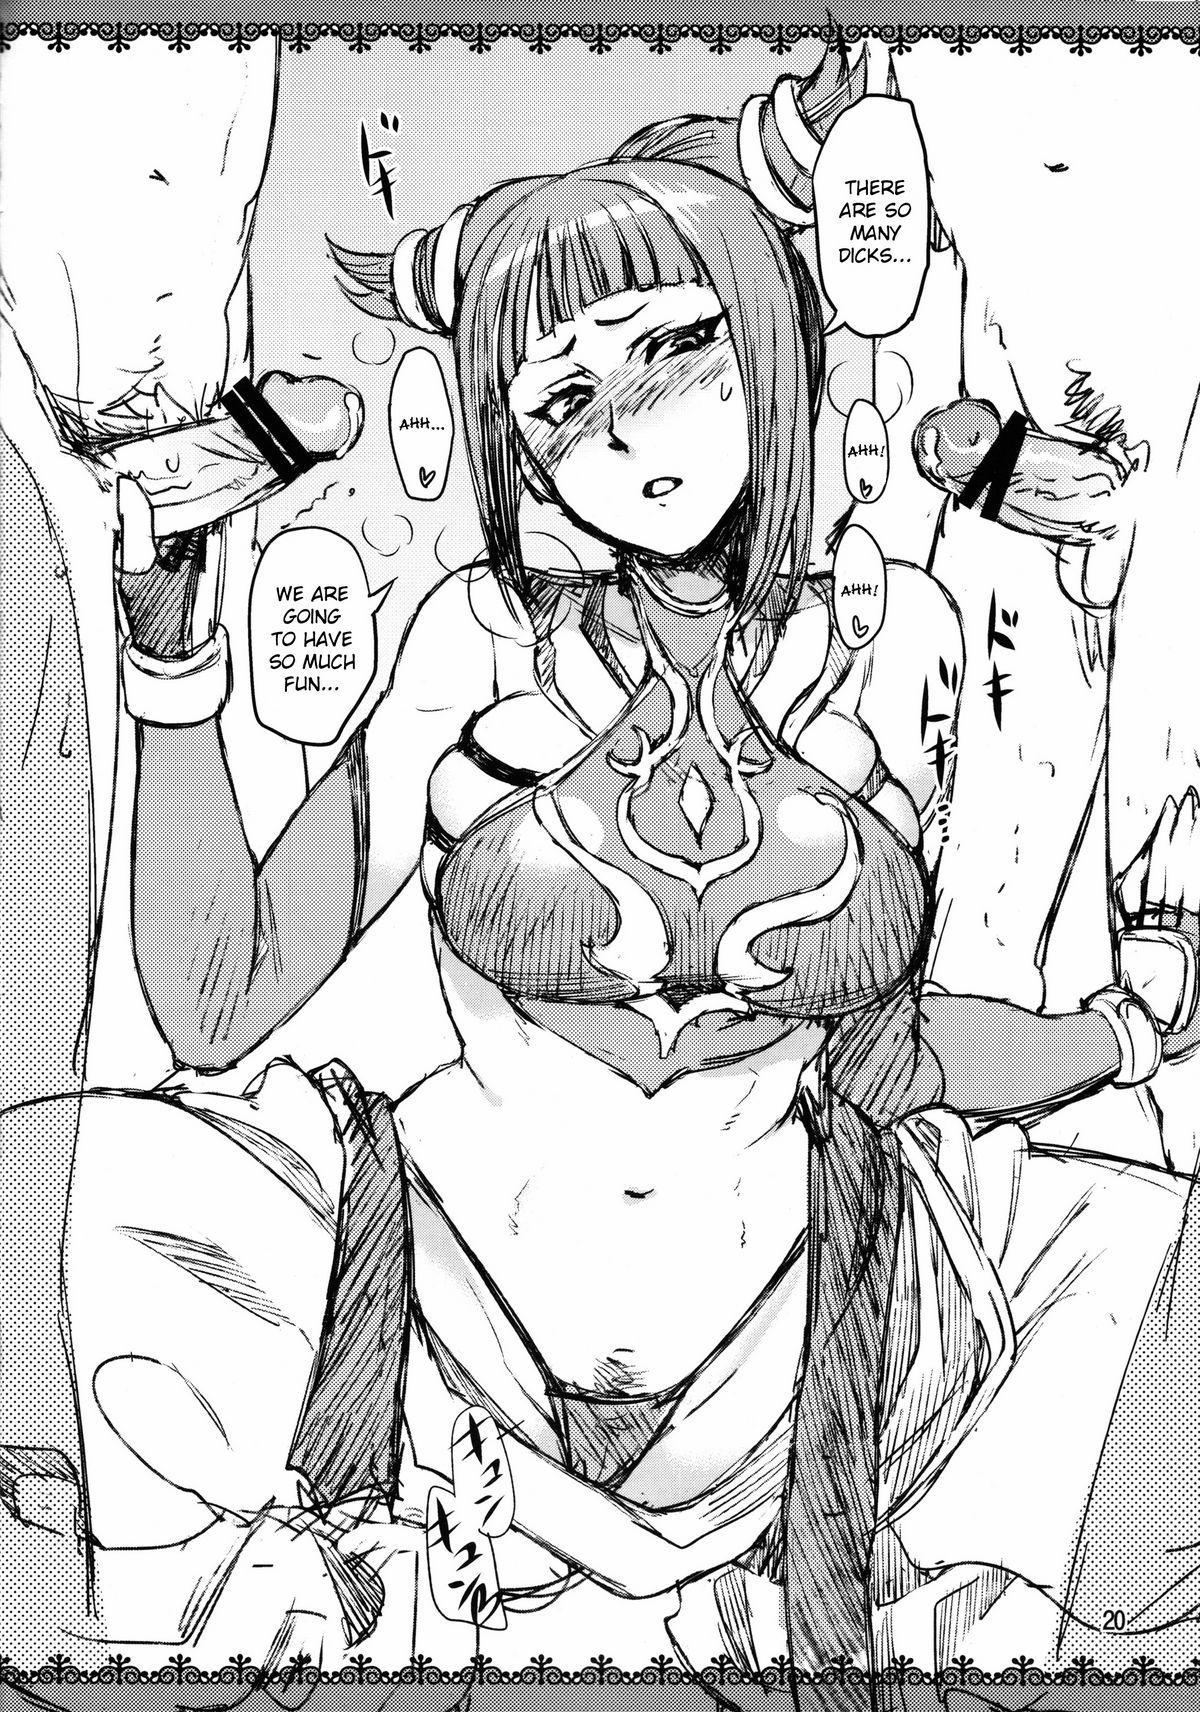 (COMIC1☆5) [ReDrop (Miyamoto Smoke, Otsumami)] Haru no Chun-Li Bon   The Chun-Li Spring Book (Street Fighter) [English] {doujin-moe.us} 19